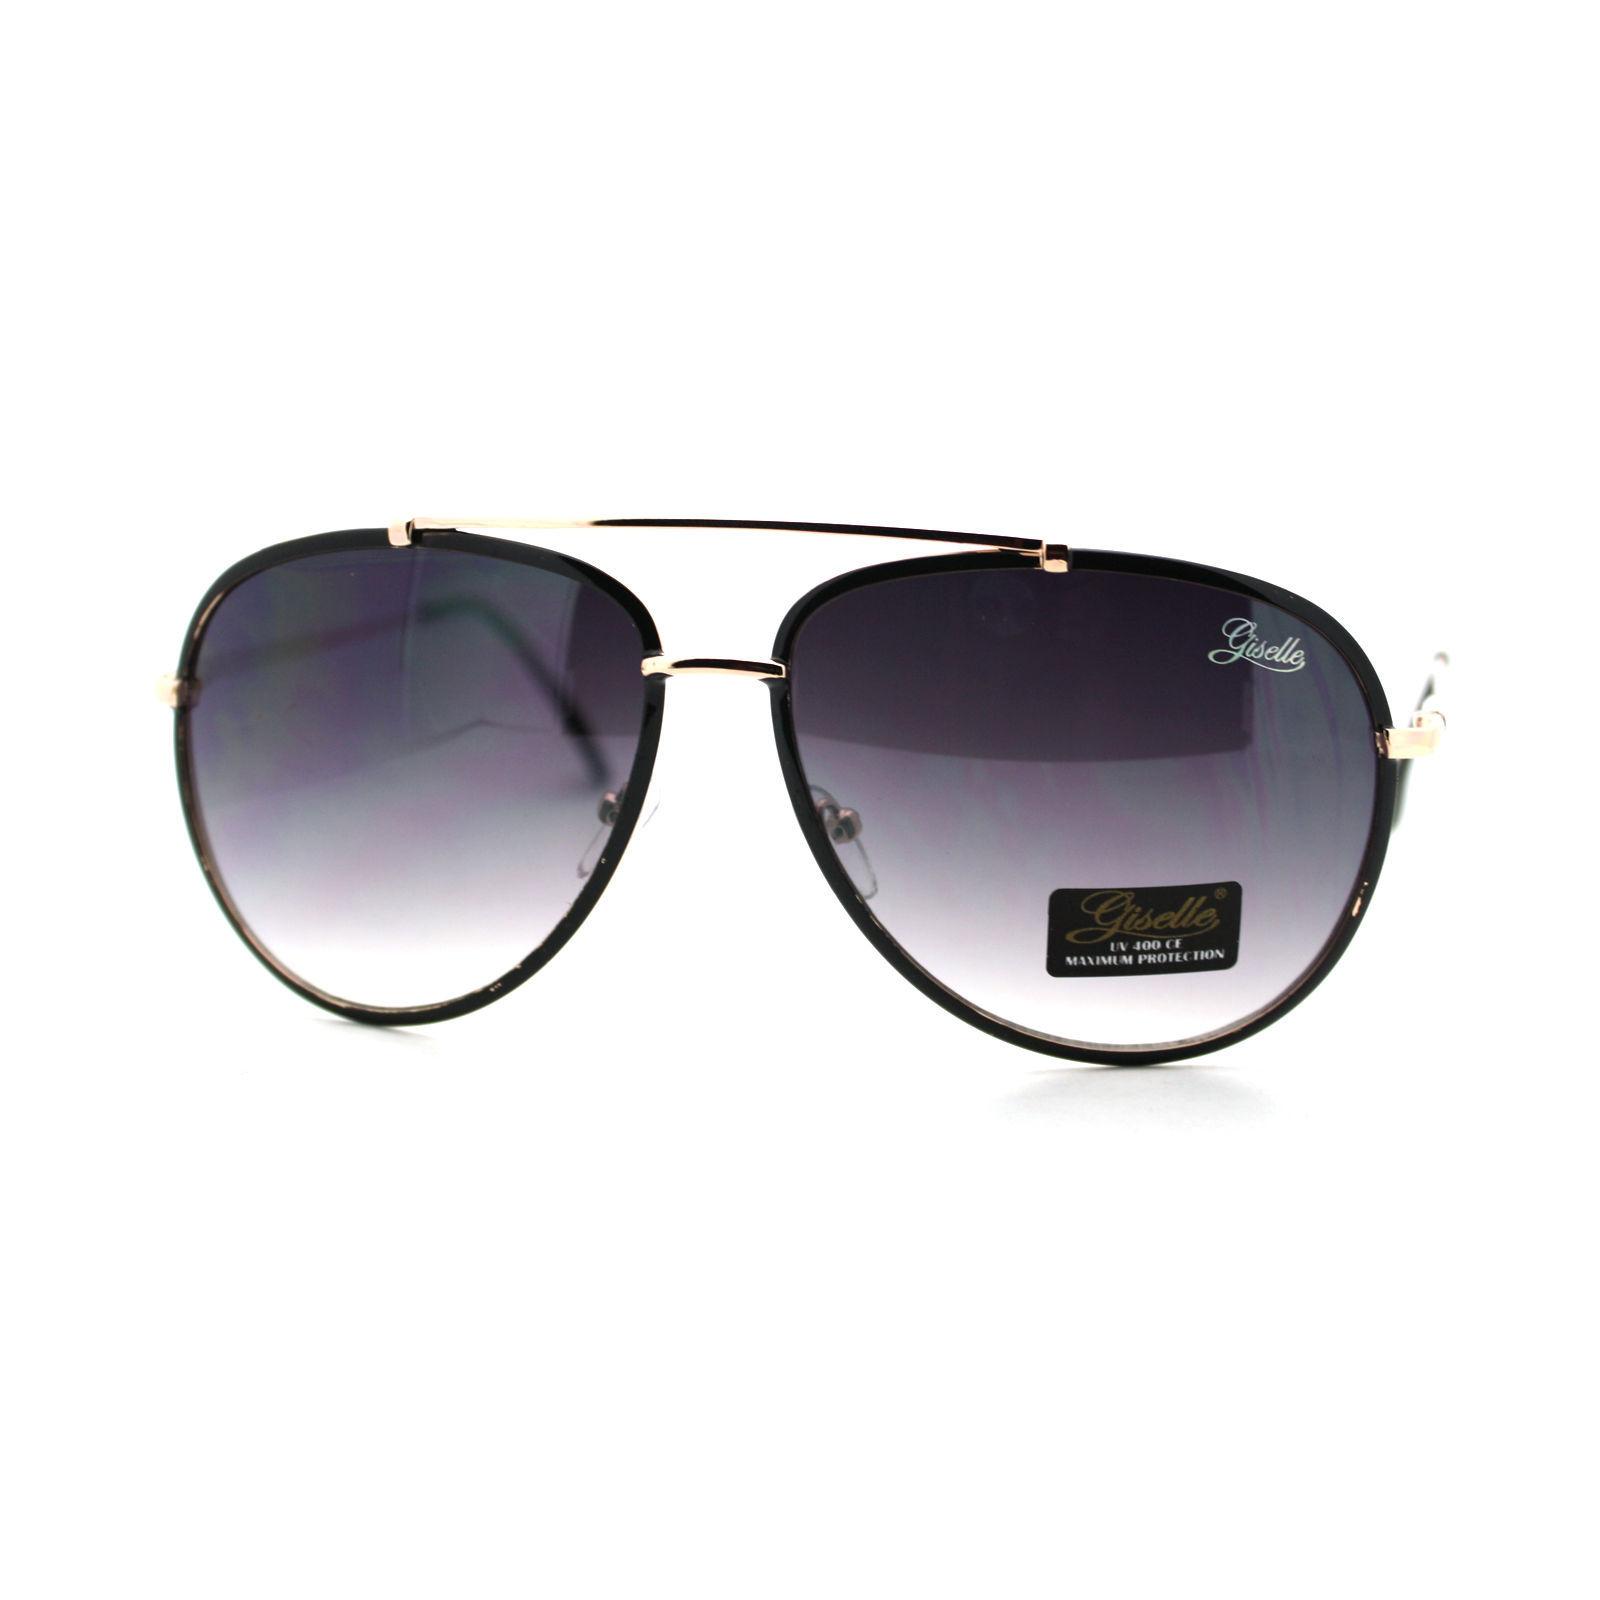 Aviator Sunglasses Small Frame | Louisiana Bucket Brigade